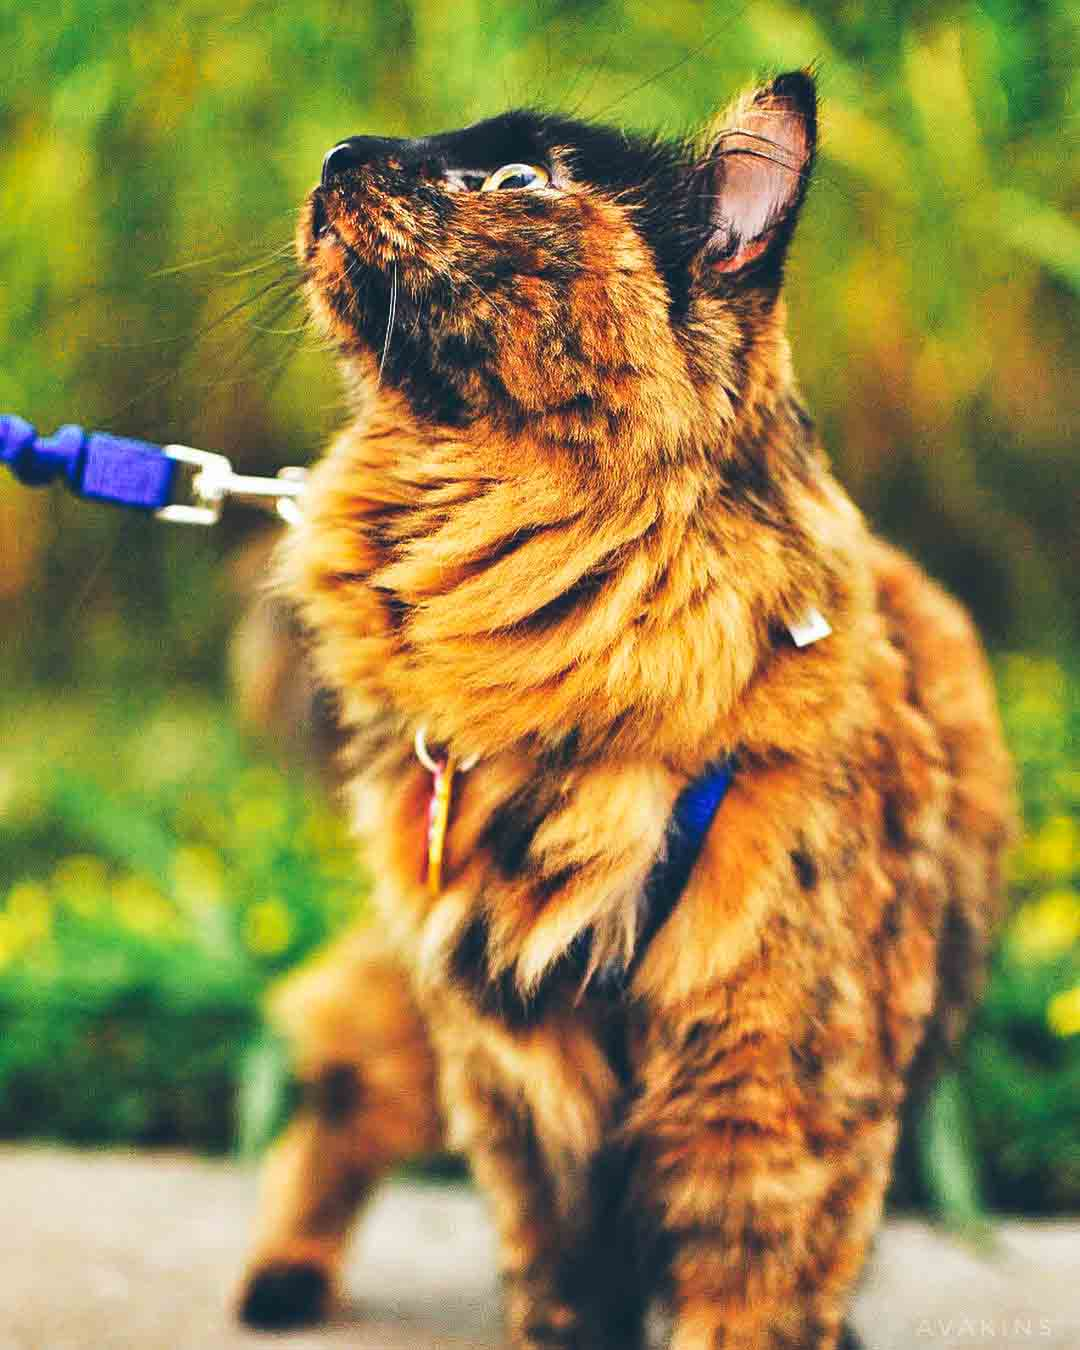 cat in grass.jpg